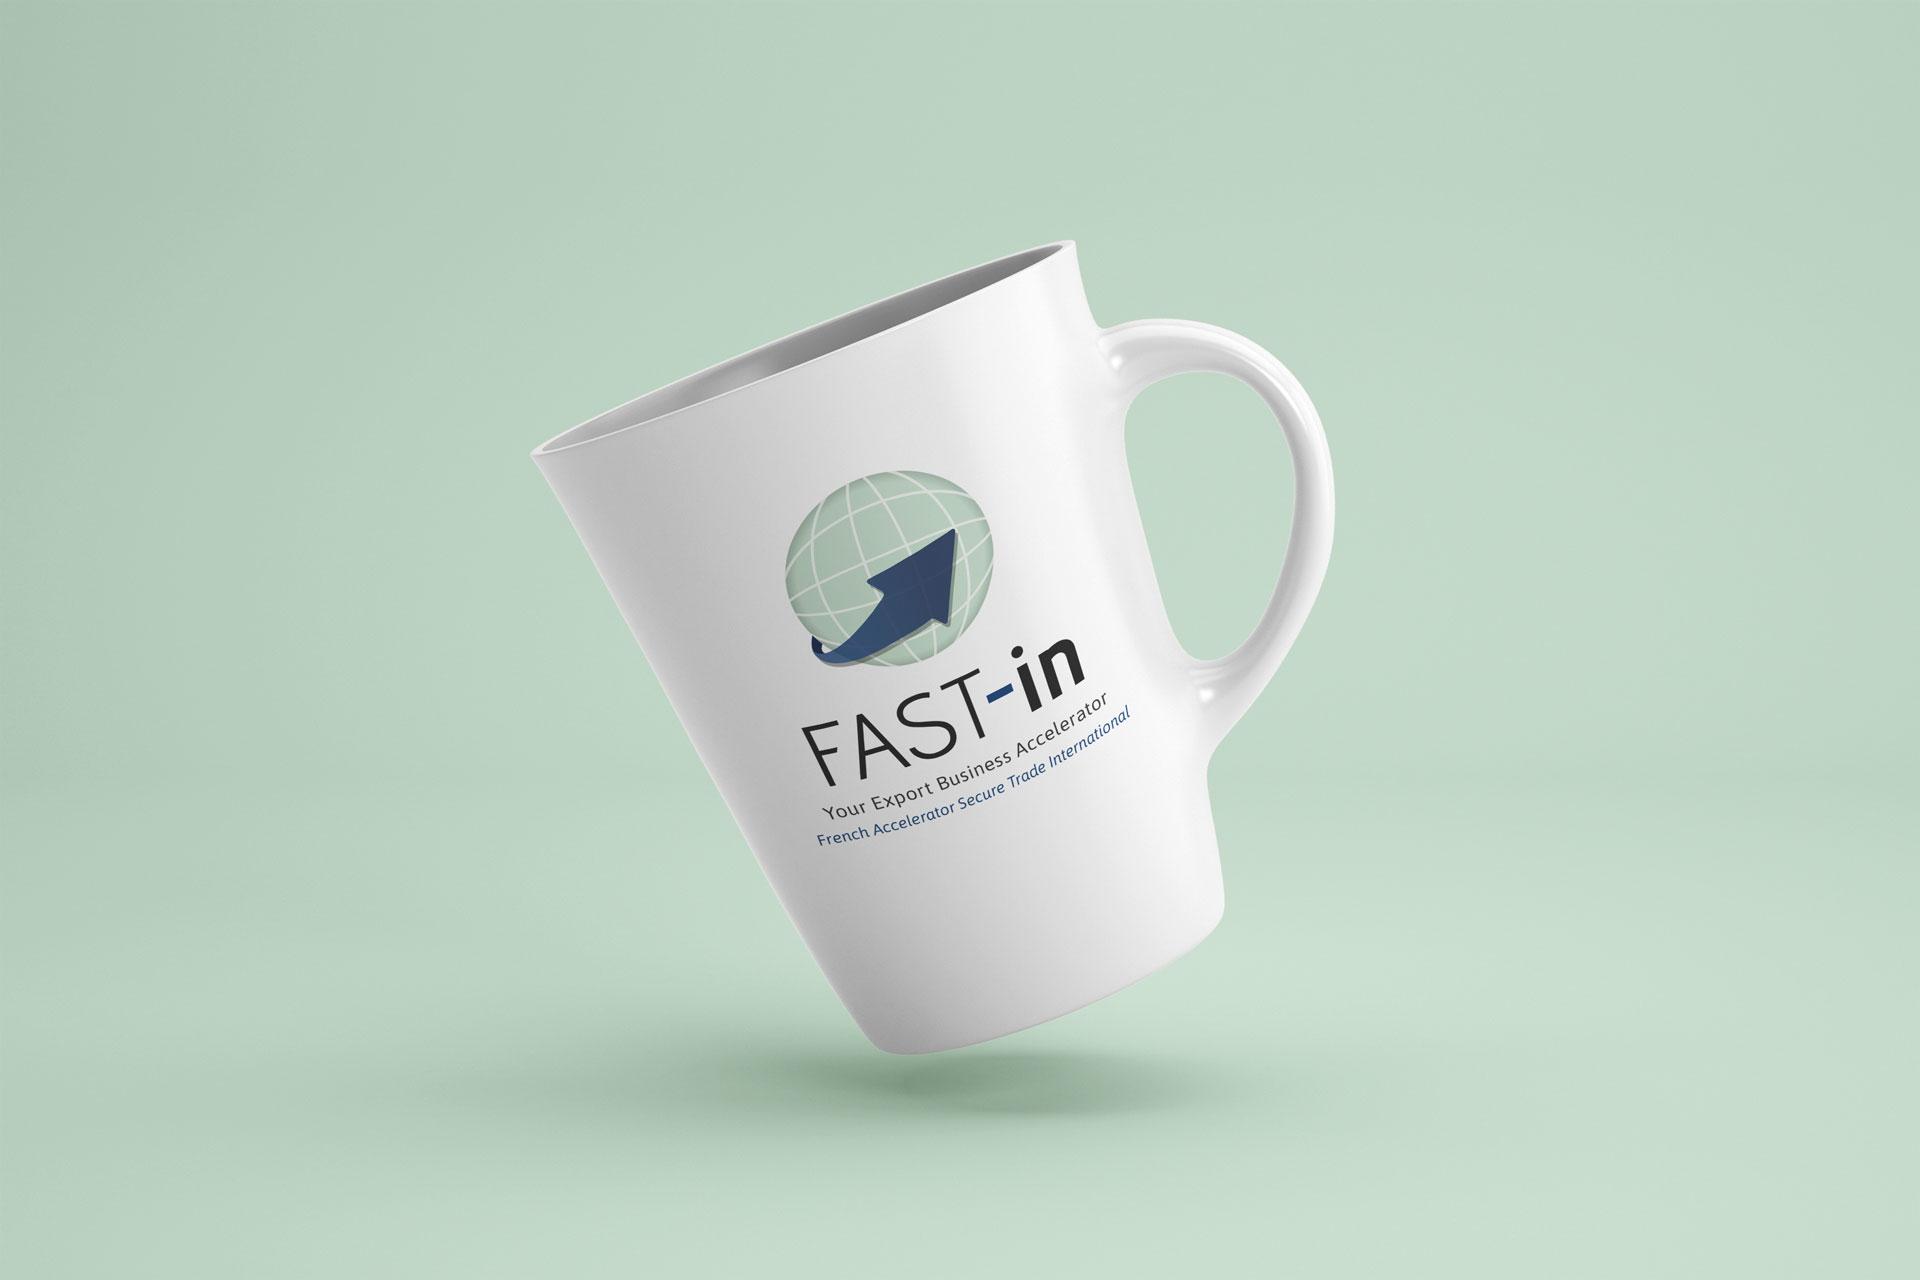 mockup logo fast-in rouen client i-media agence de communication digitale